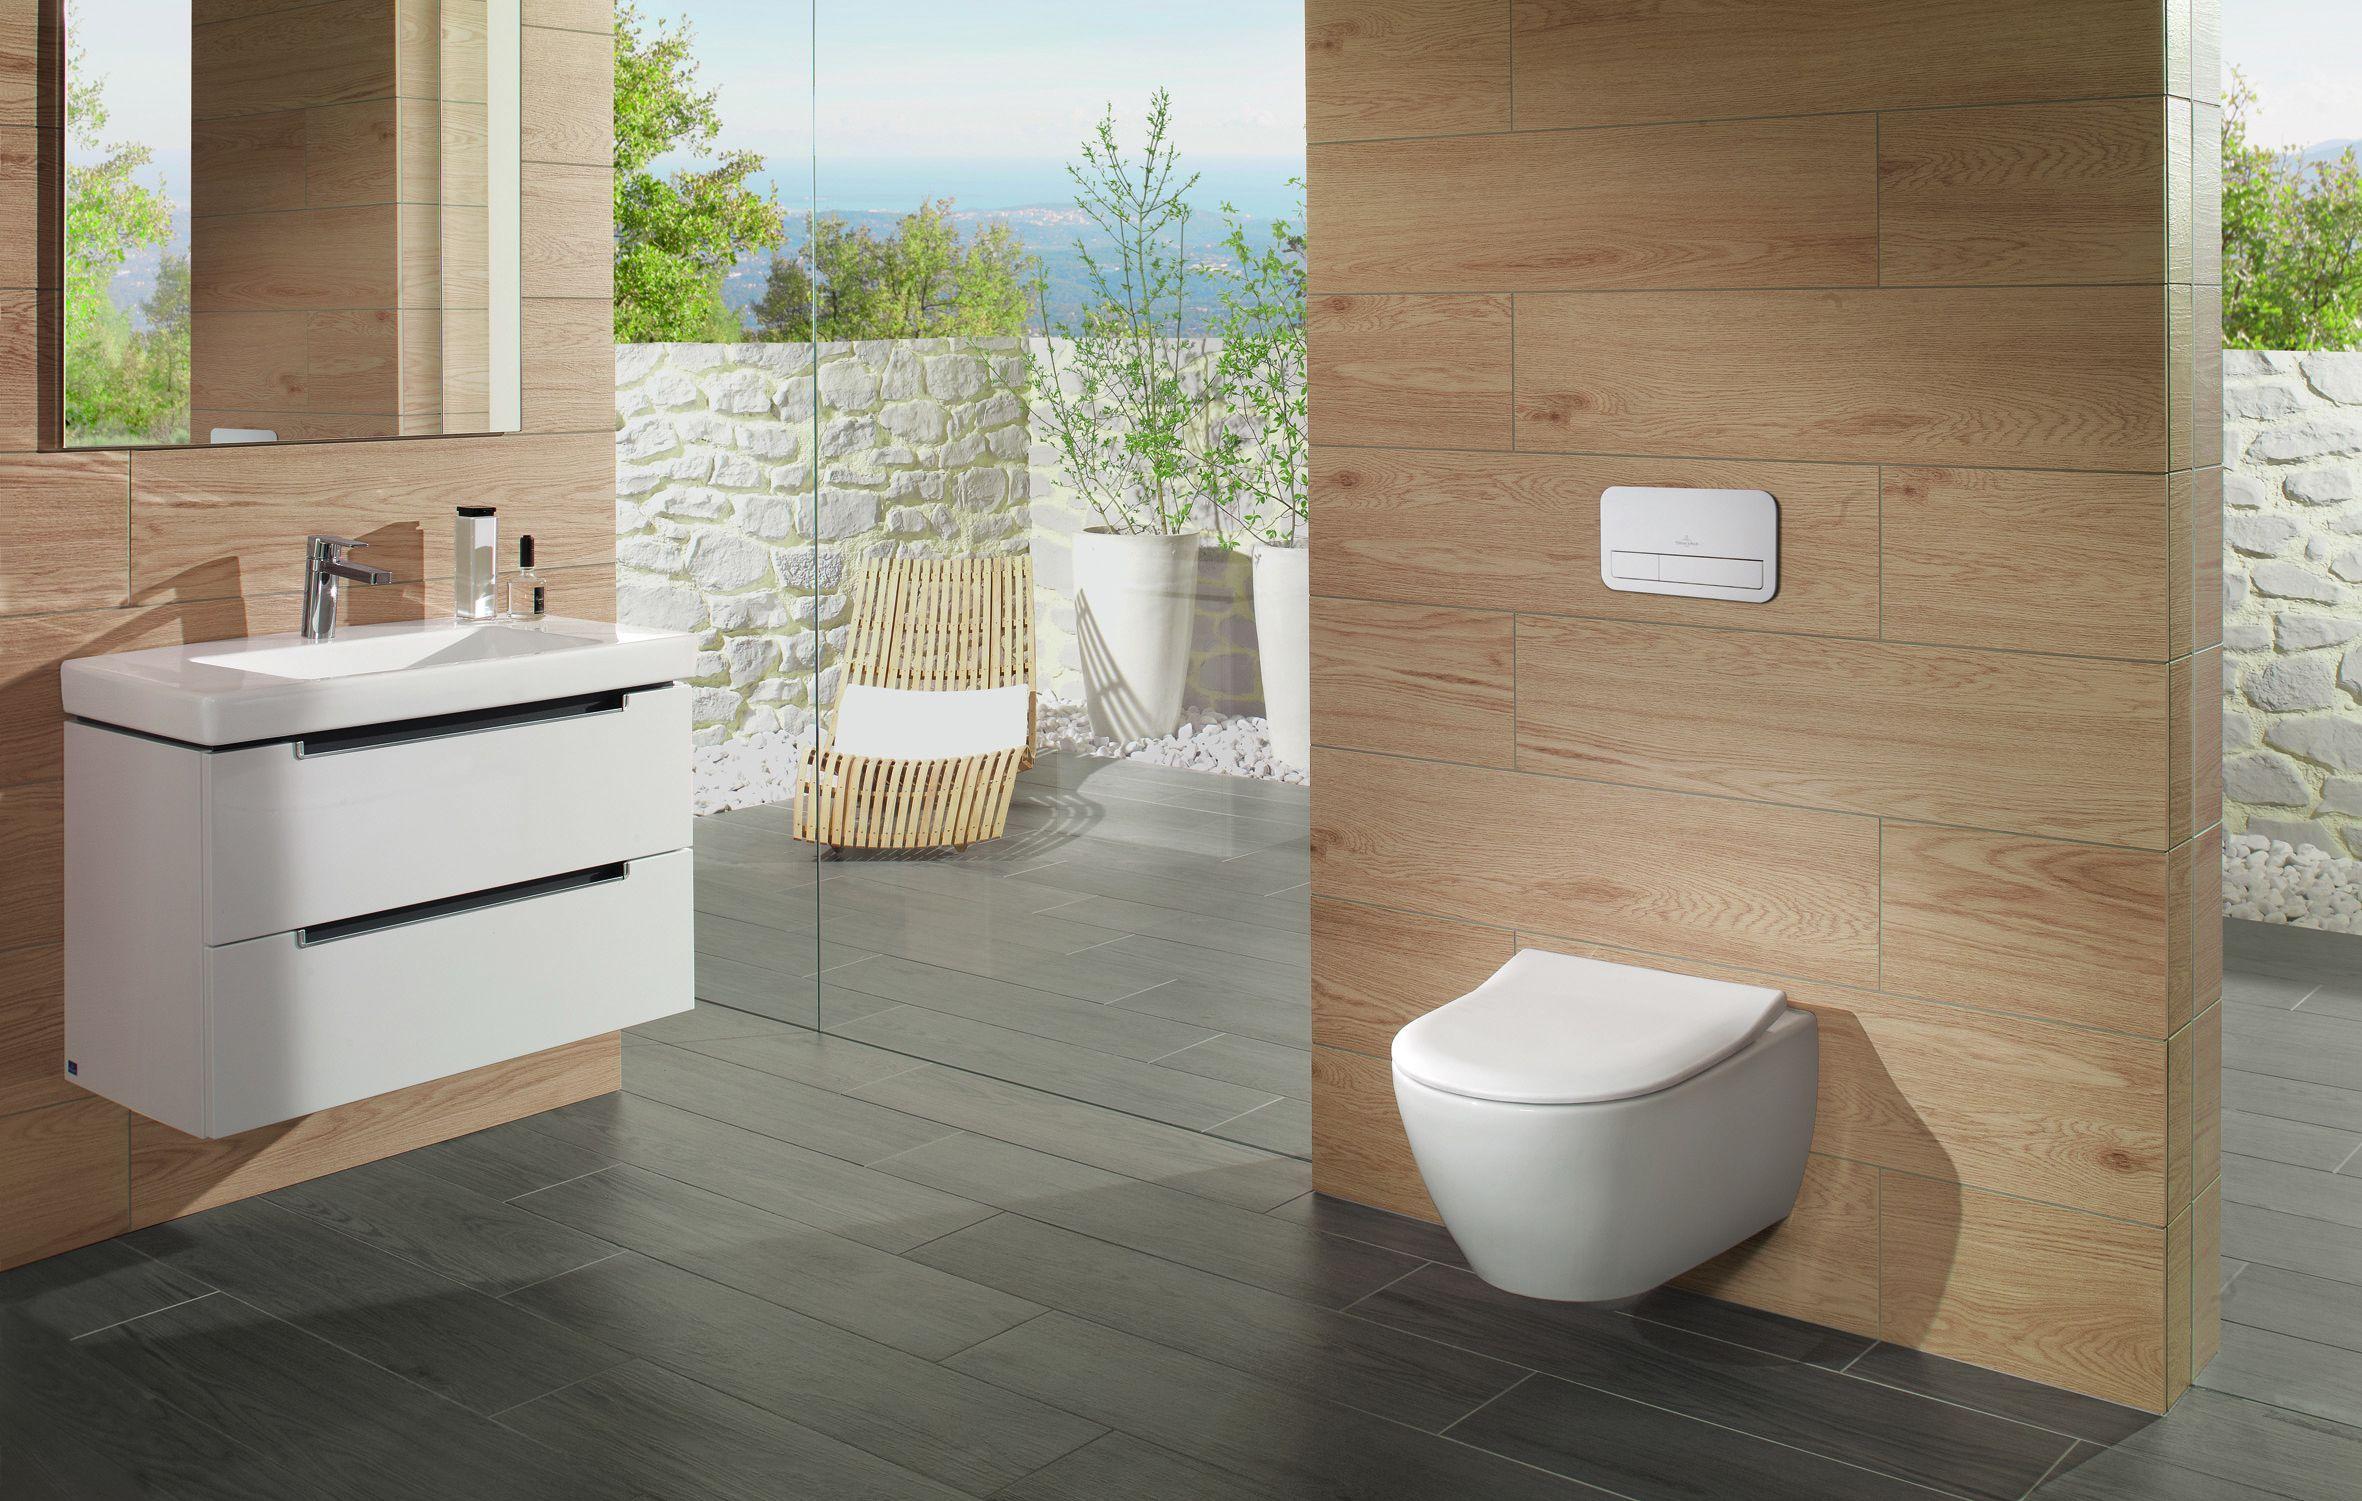 die besten 25 sp lrandloses wc ideen auf pinterest. Black Bedroom Furniture Sets. Home Design Ideas